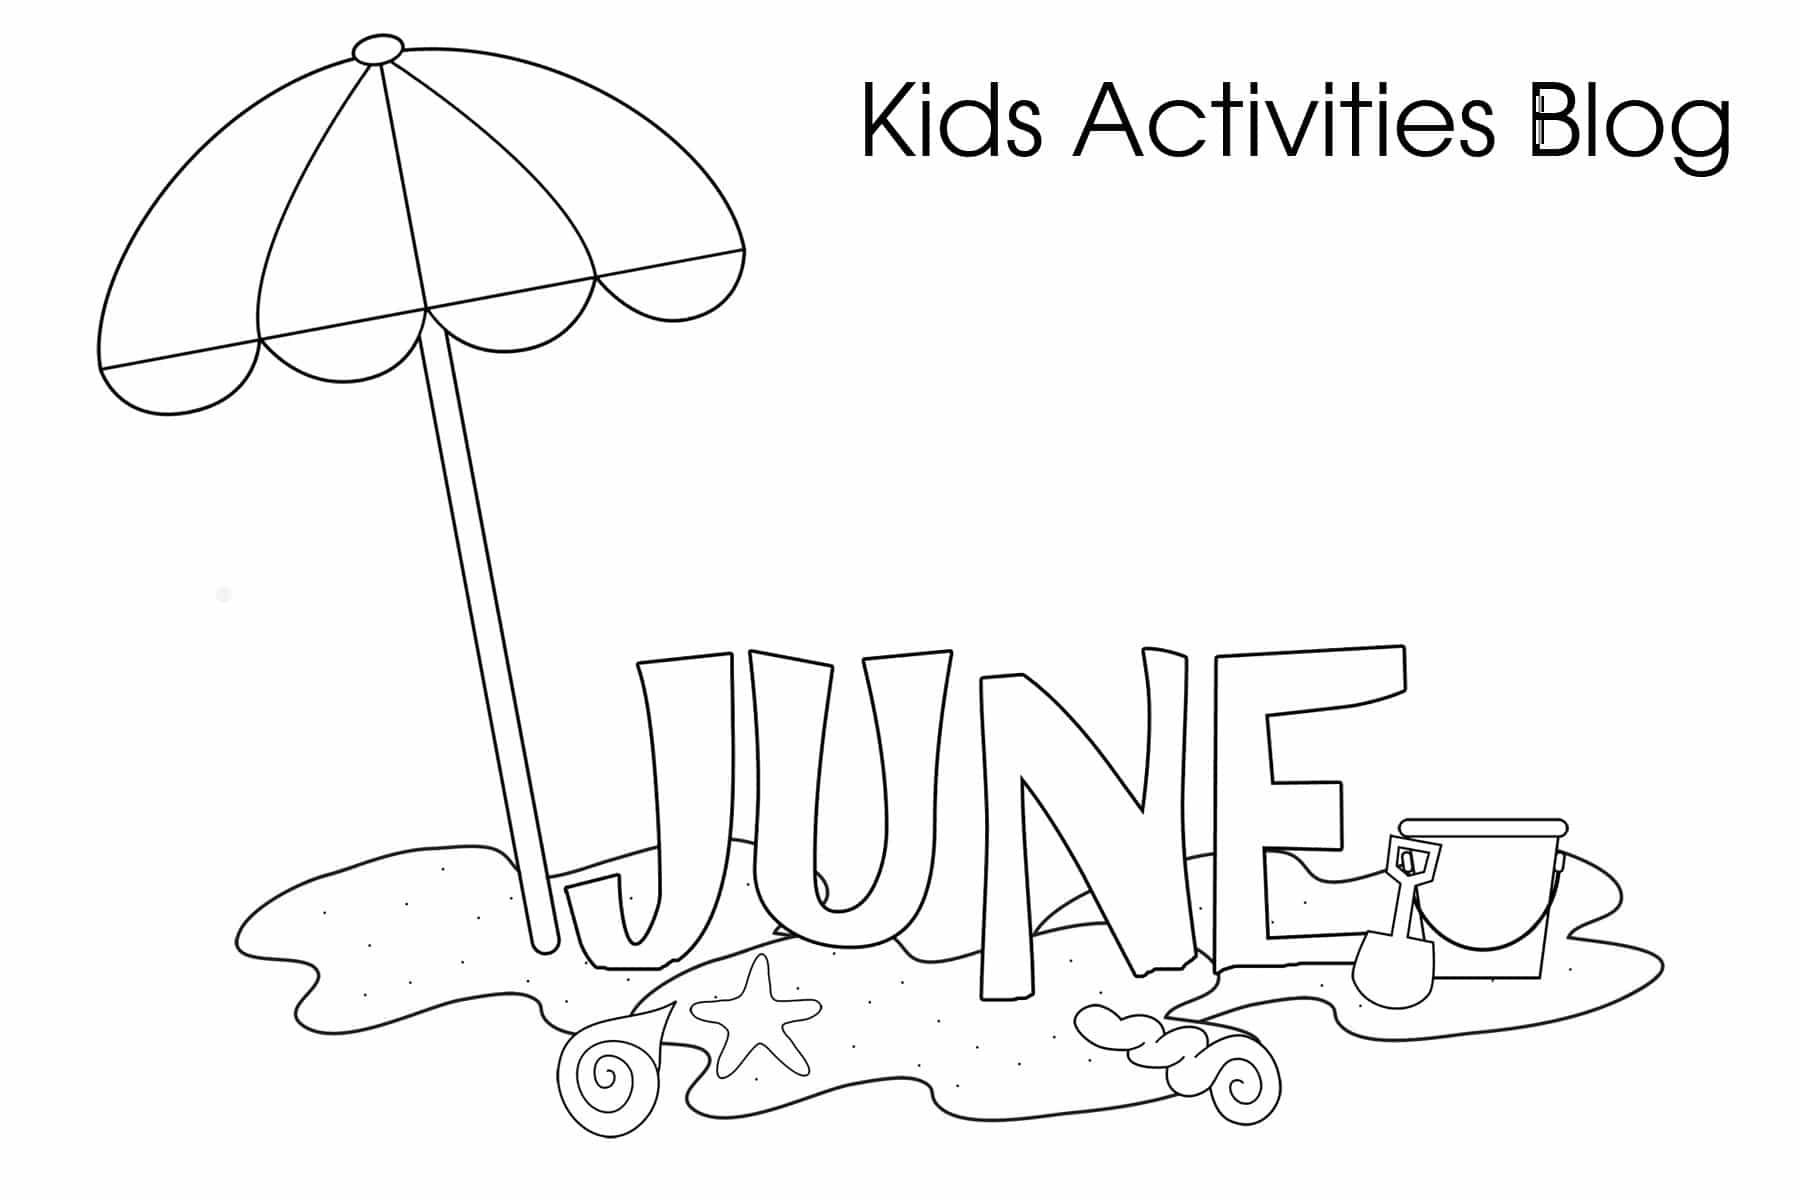 June Coloring Pages Preschoolers